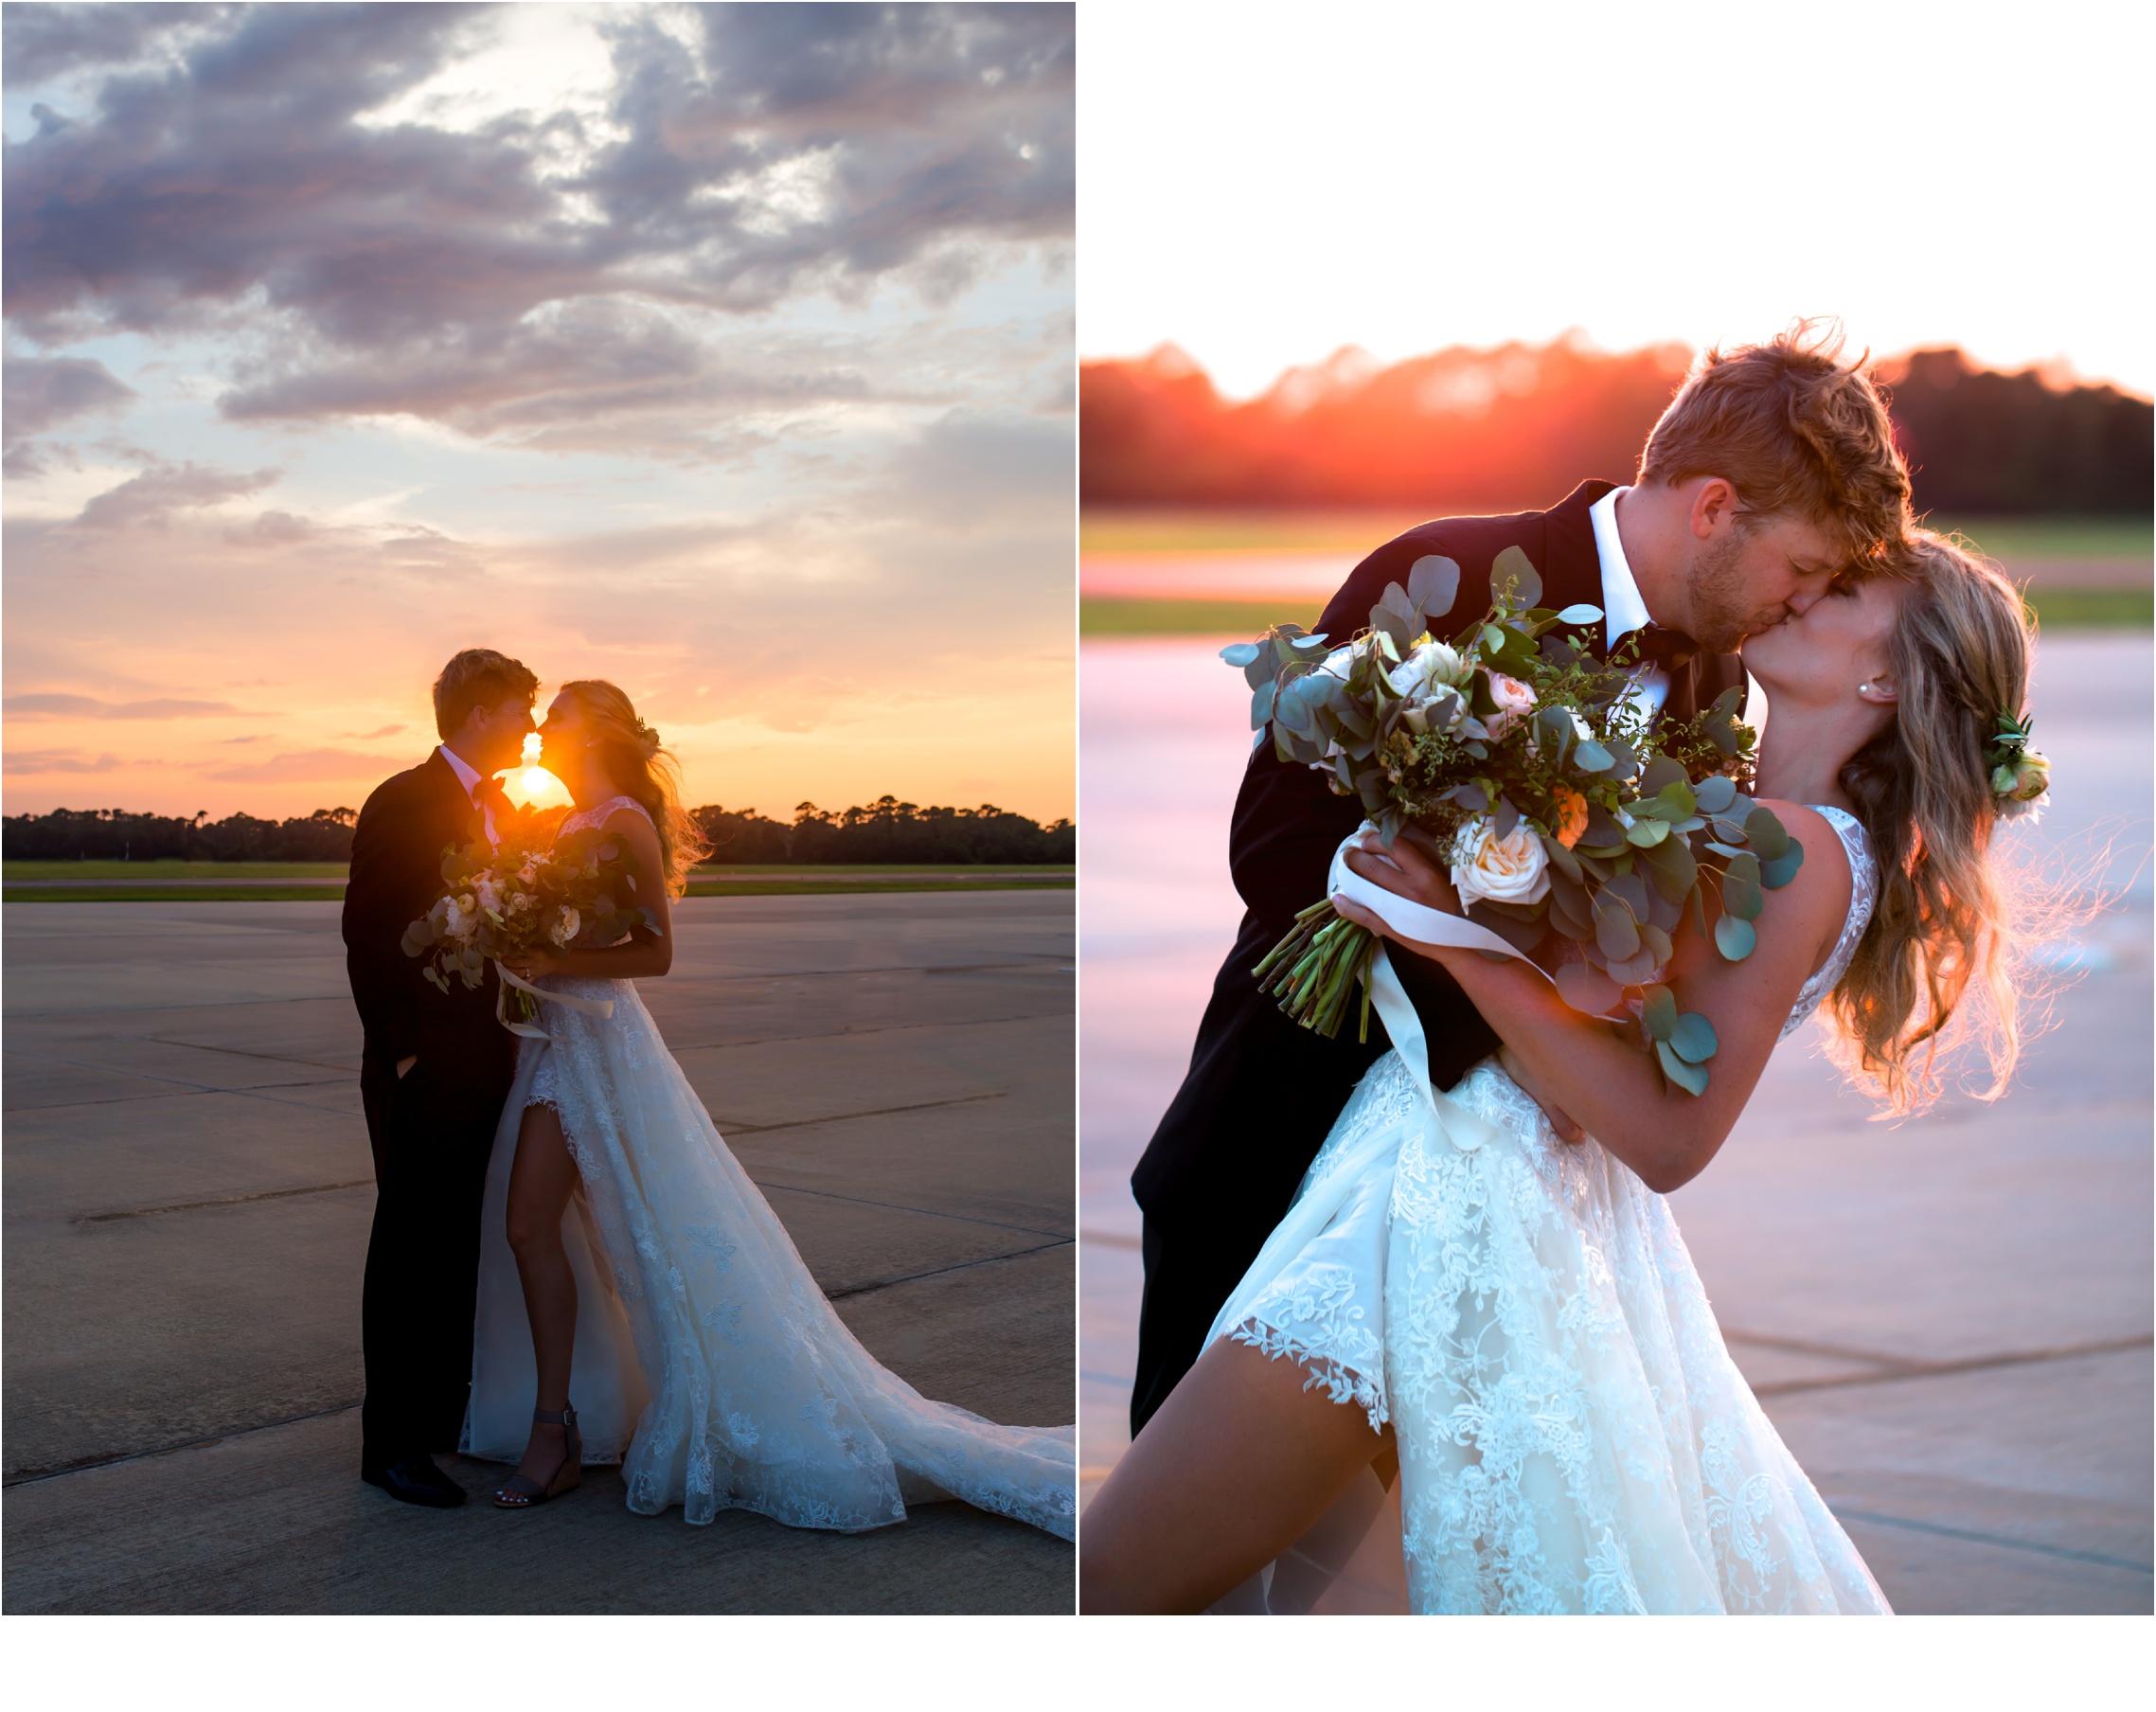 Rainey_Gregg_Photography_St._Simons_Island_Georgia_California_Wedding_Portrait_Photography_0084.jpg